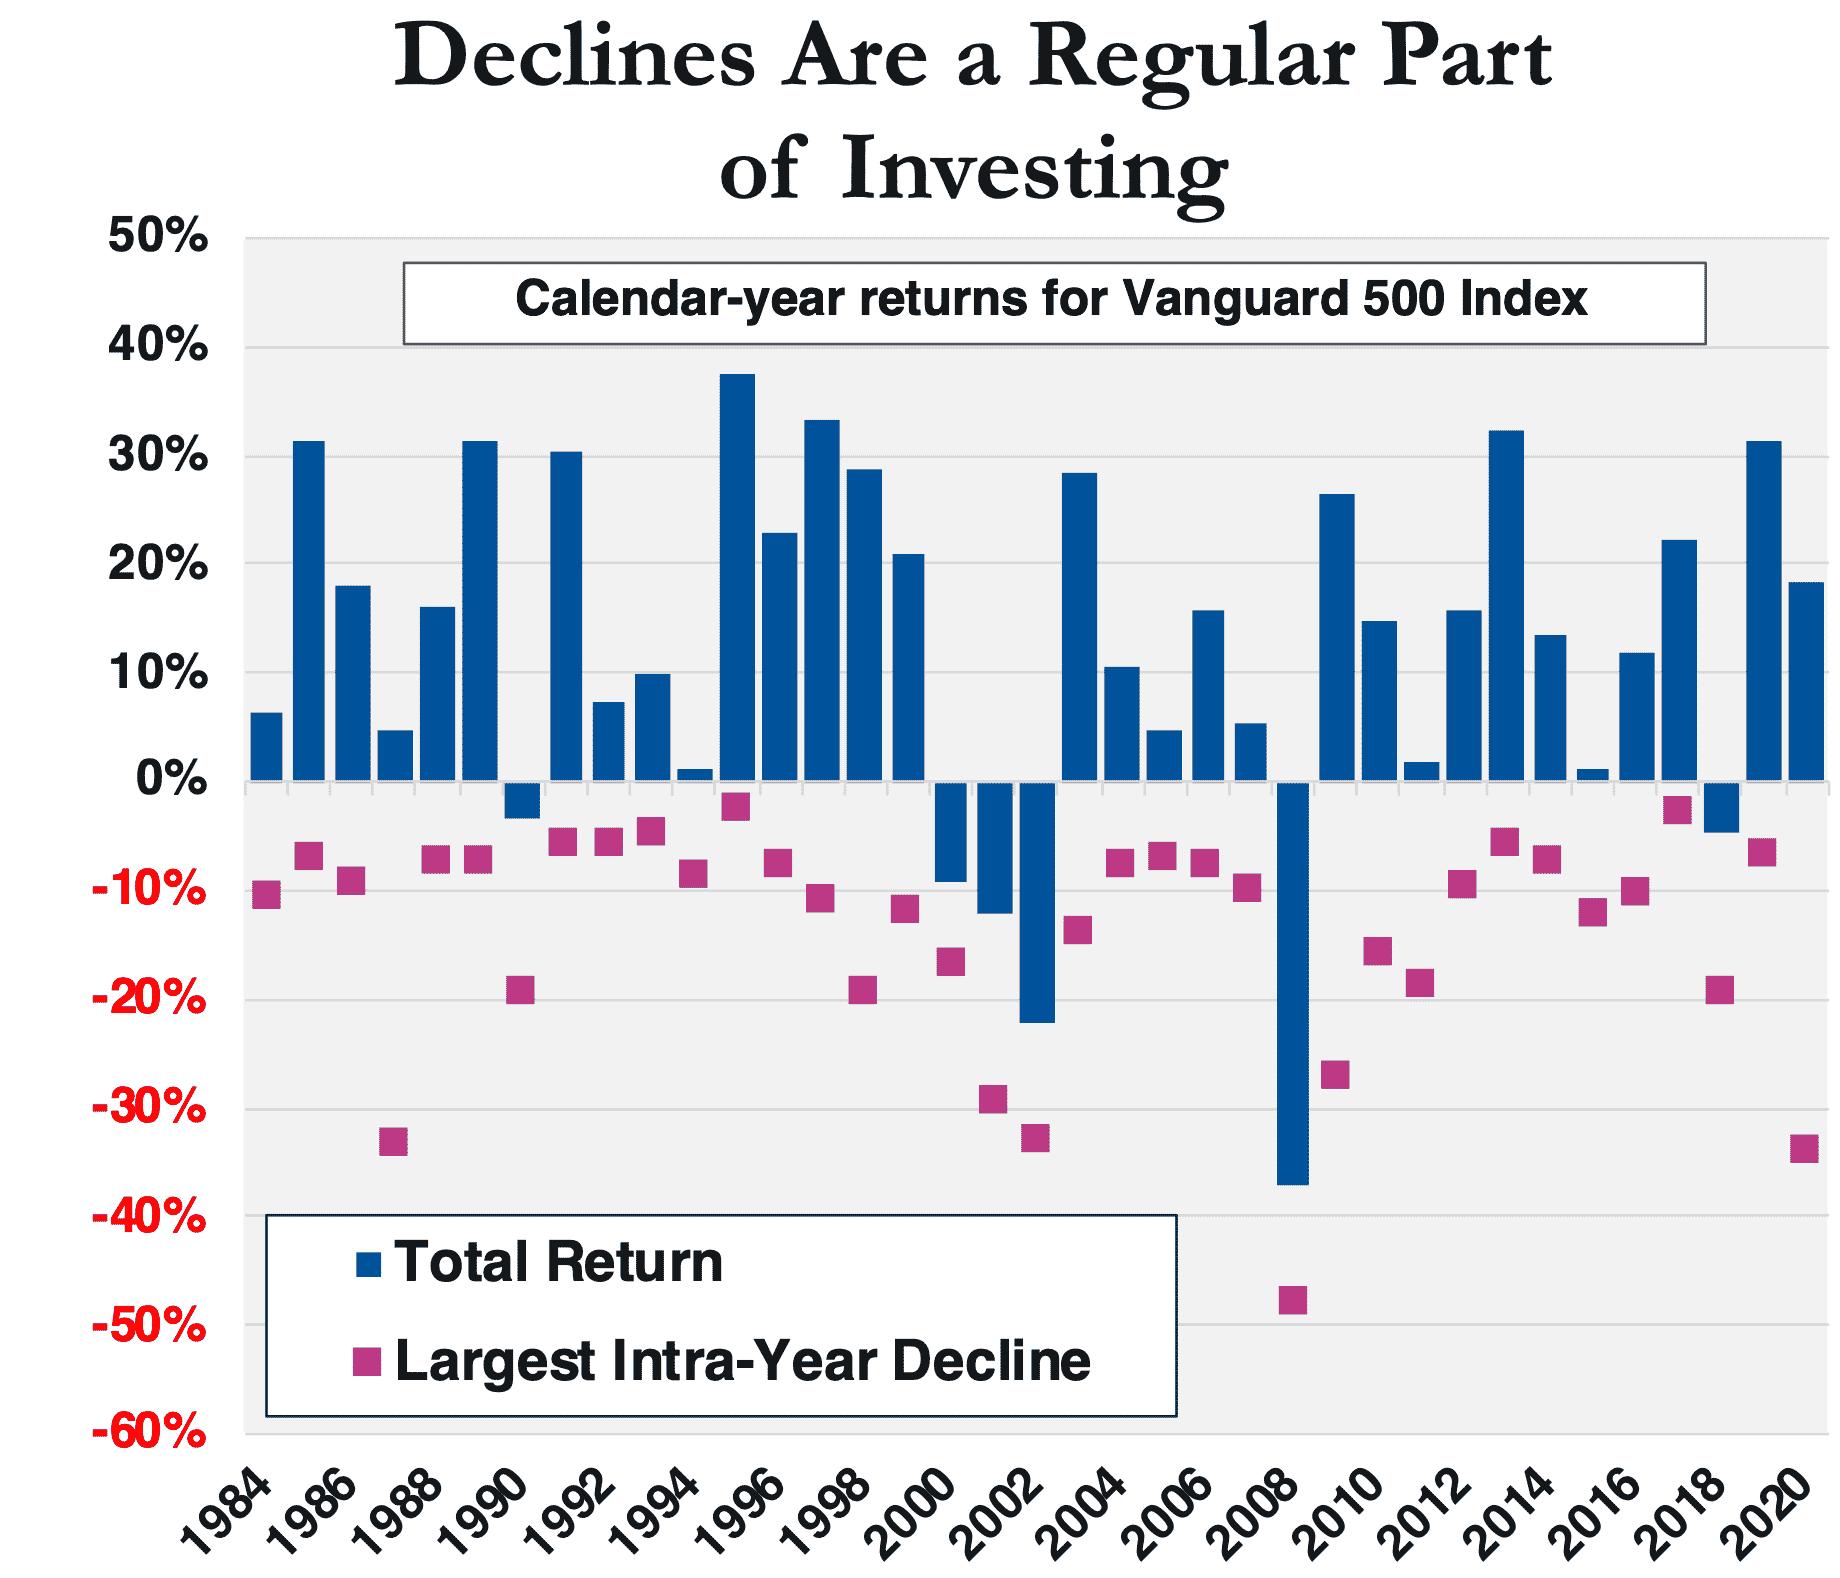 Chart displaying calendar-year returns for vanguard 500 index